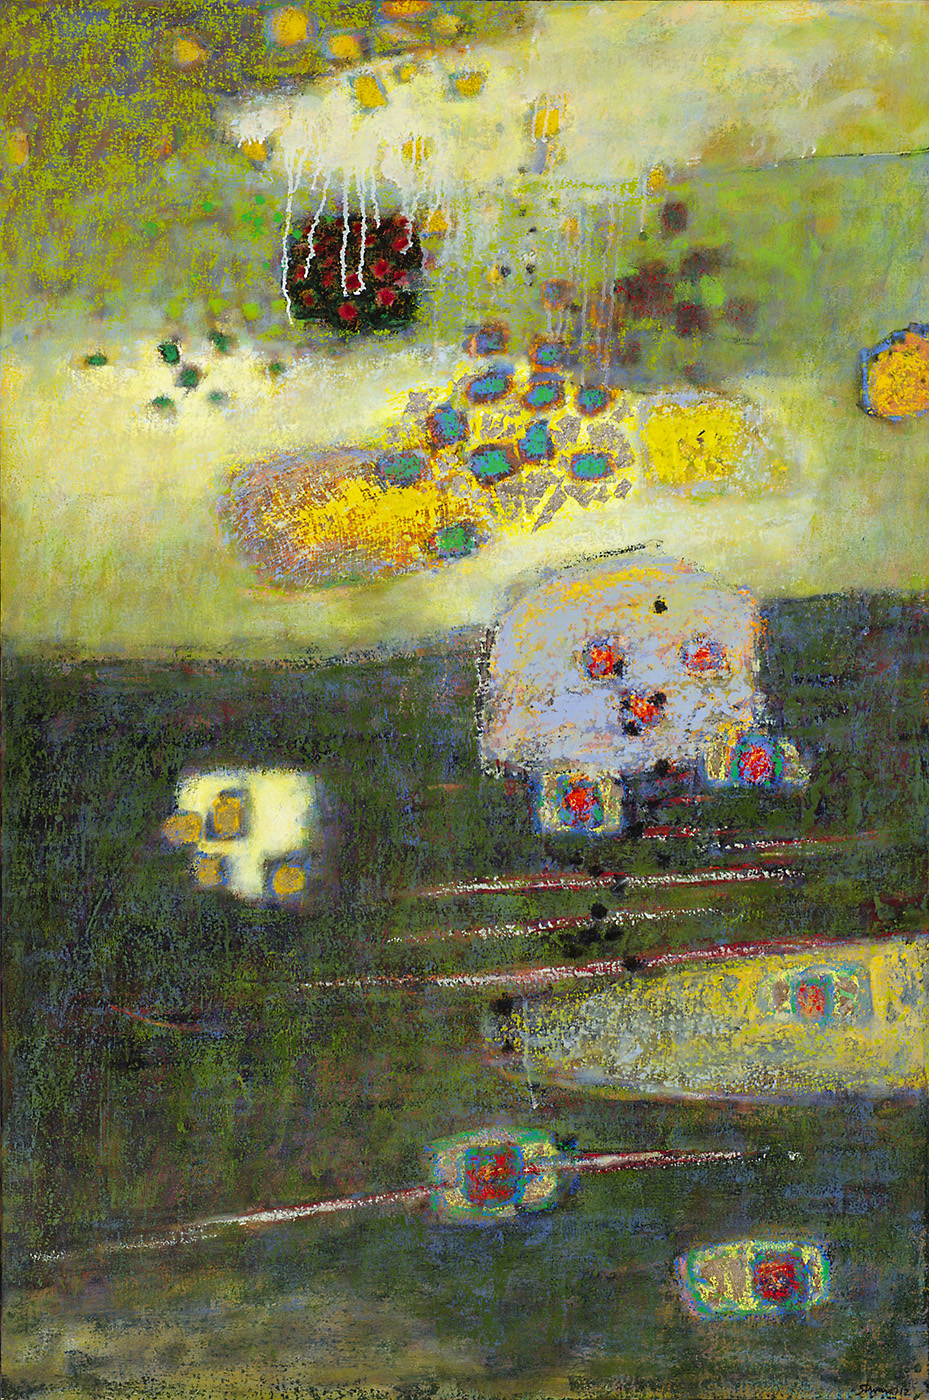 "Hazy Suspension   | oil on canvas | 48 x 32"" | 2012"